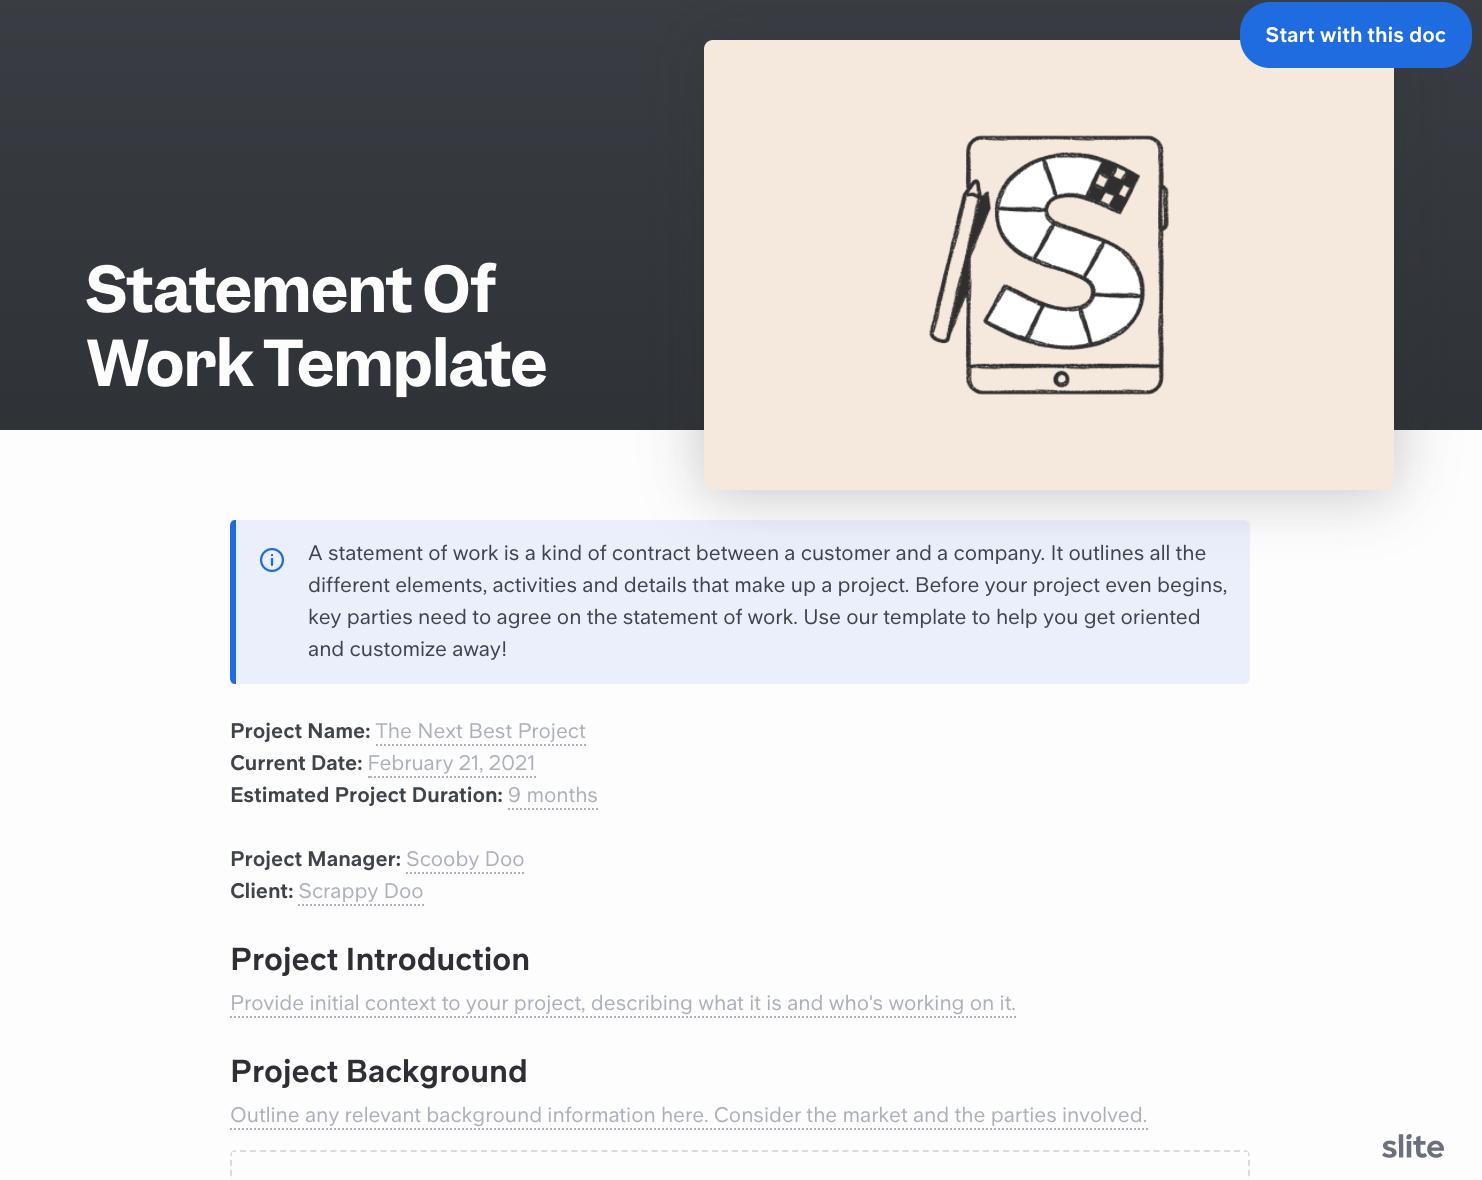 Slite statement of work template